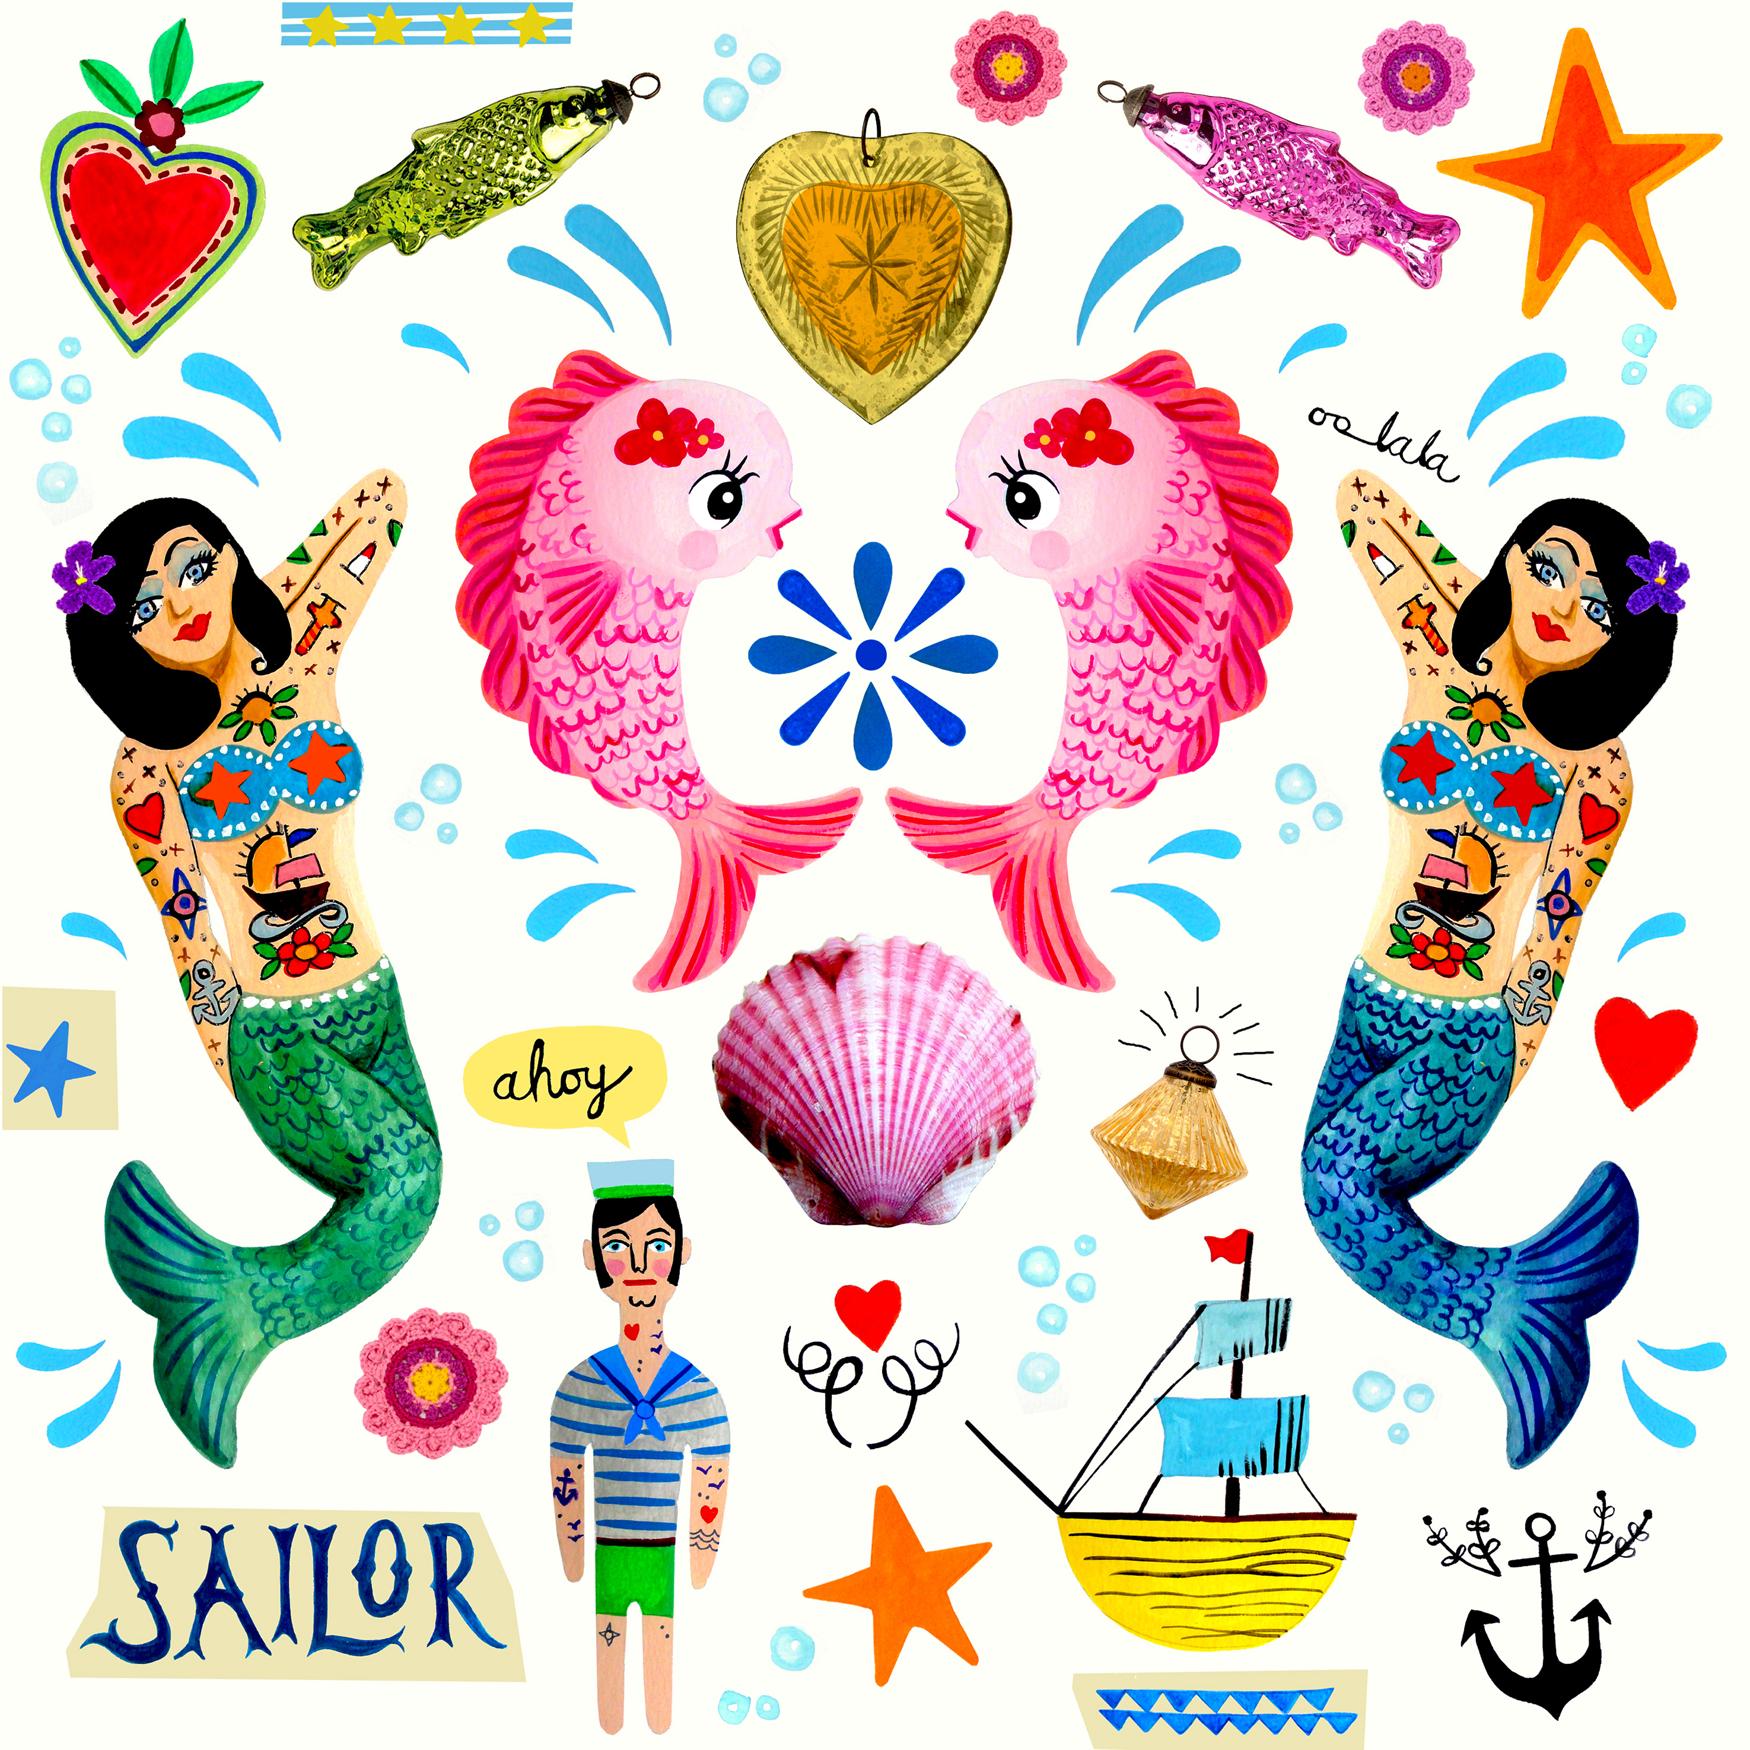 Oceana-emmajayne-designs.jpg